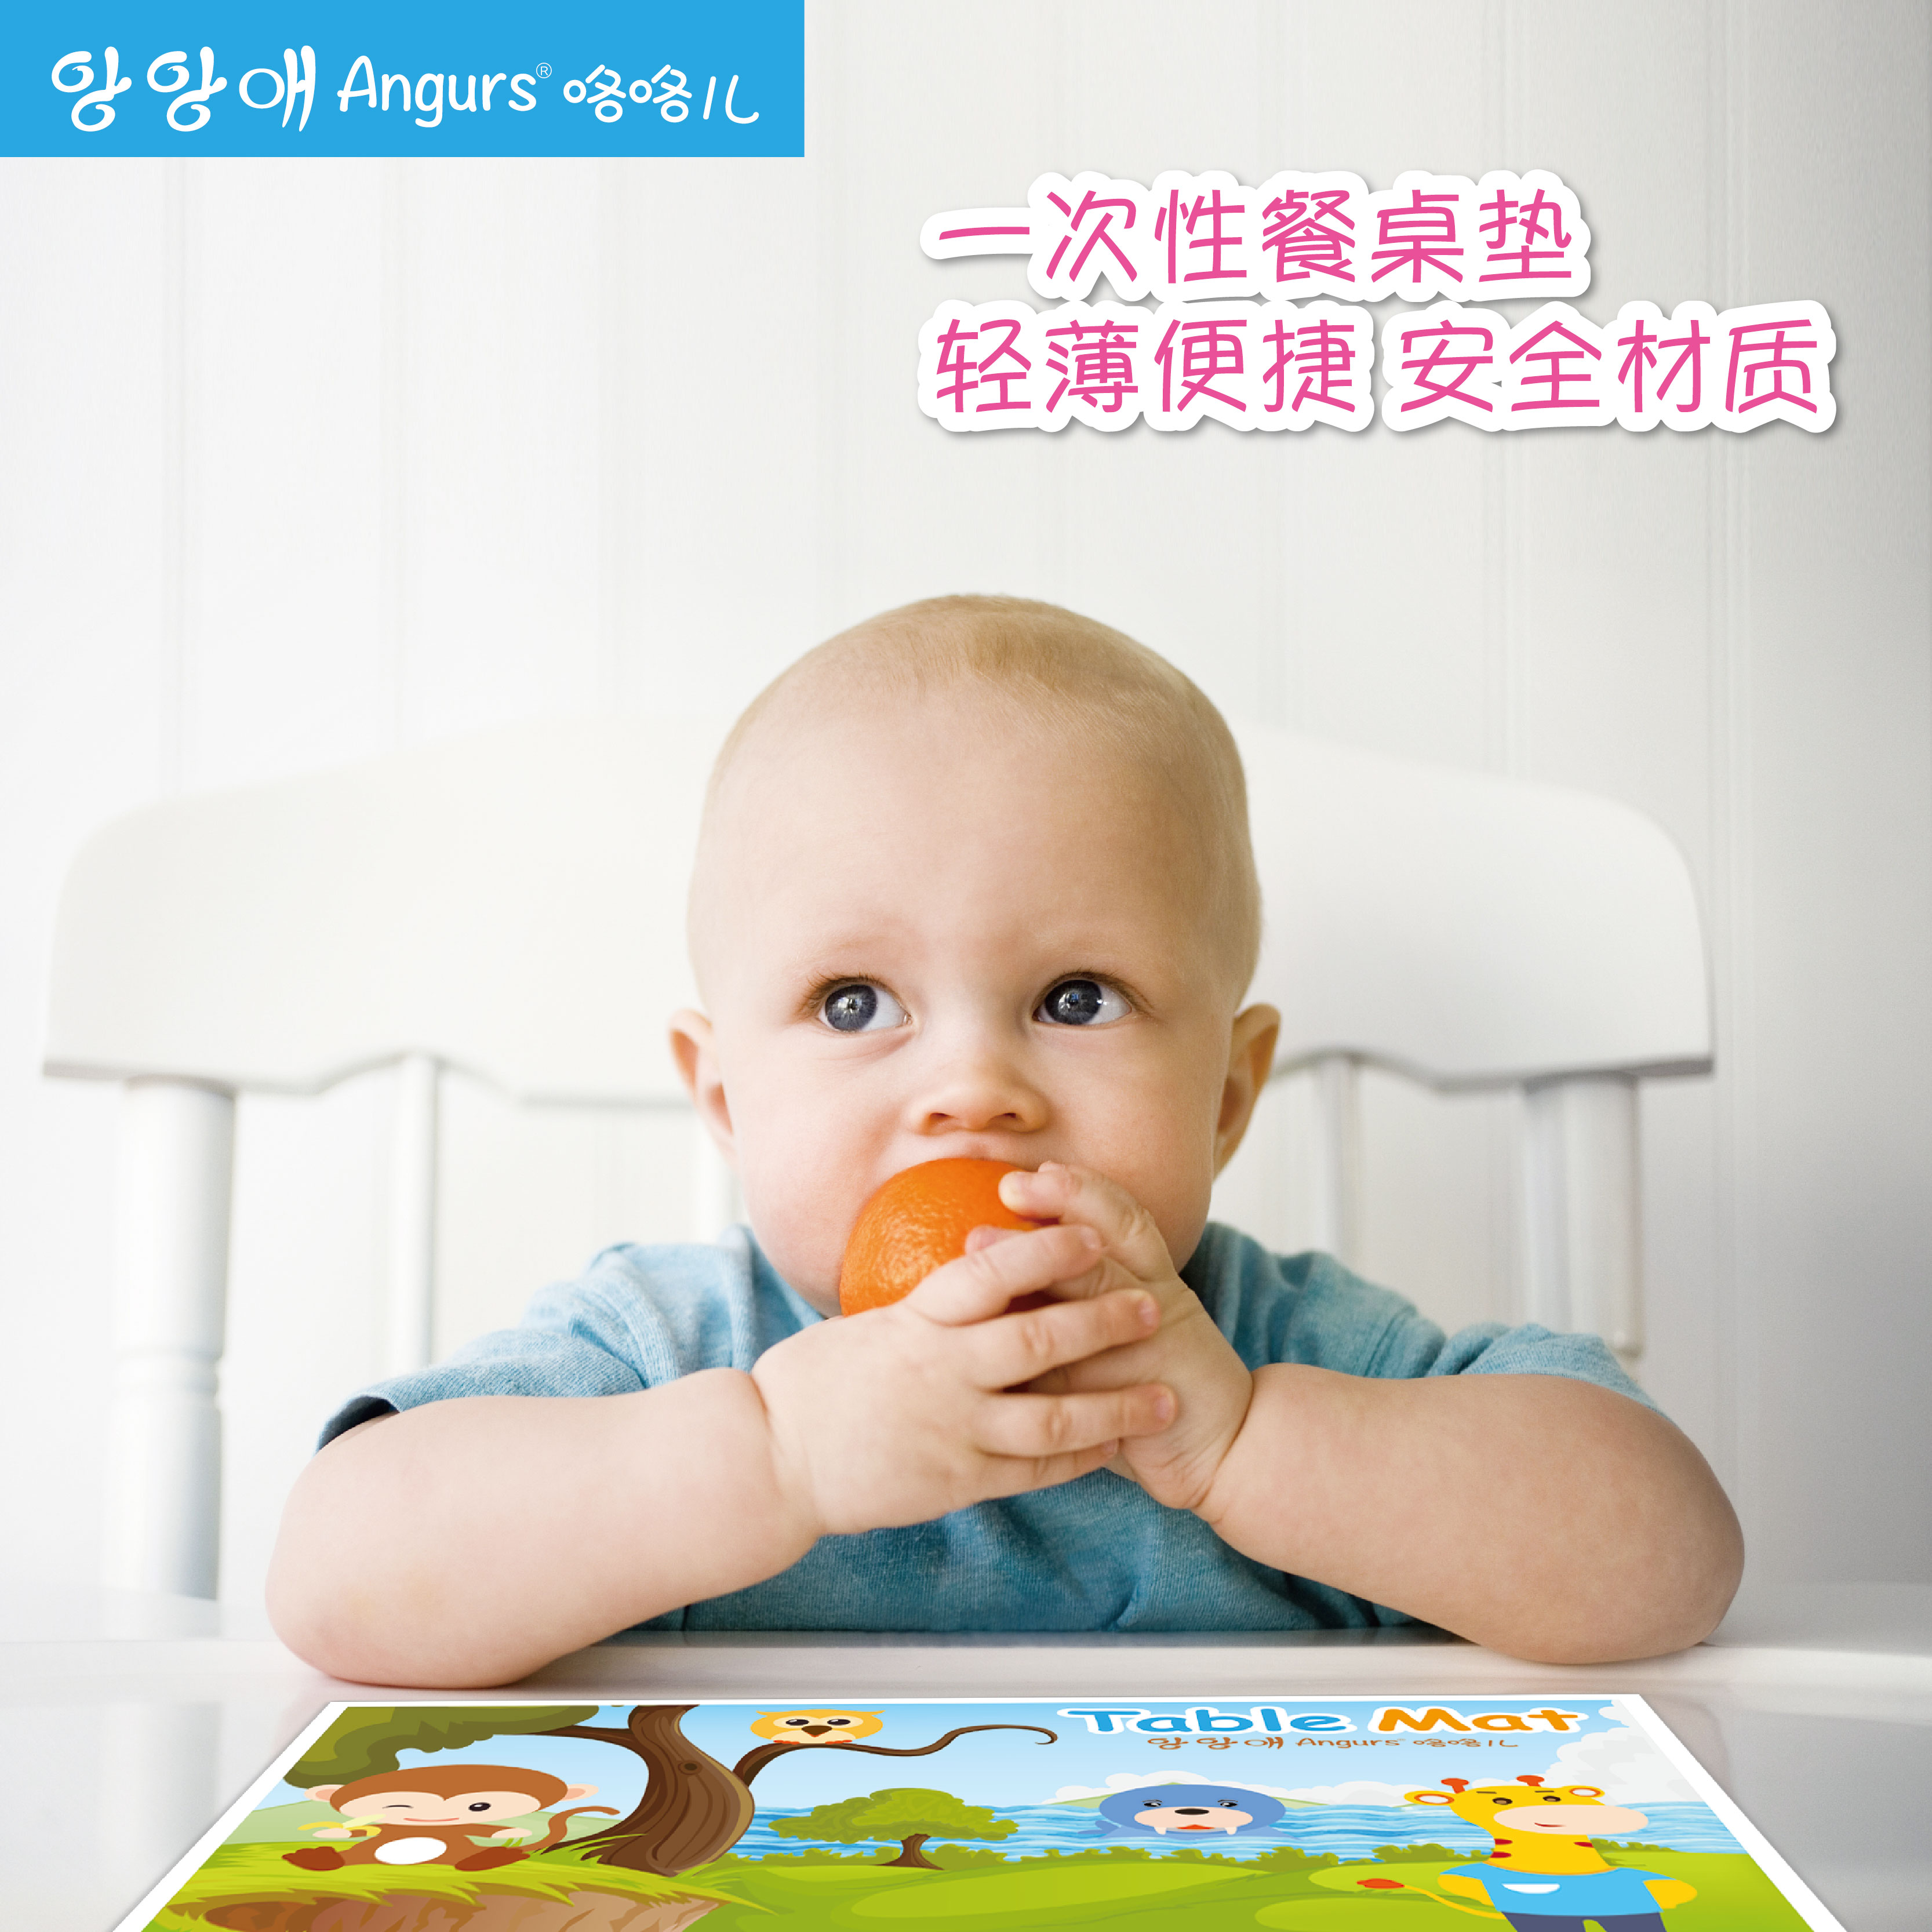 Angurs咯咯儿韩国宝宝餐垫儿童婴儿一次性便携餐桌垫防水桌布10片/包